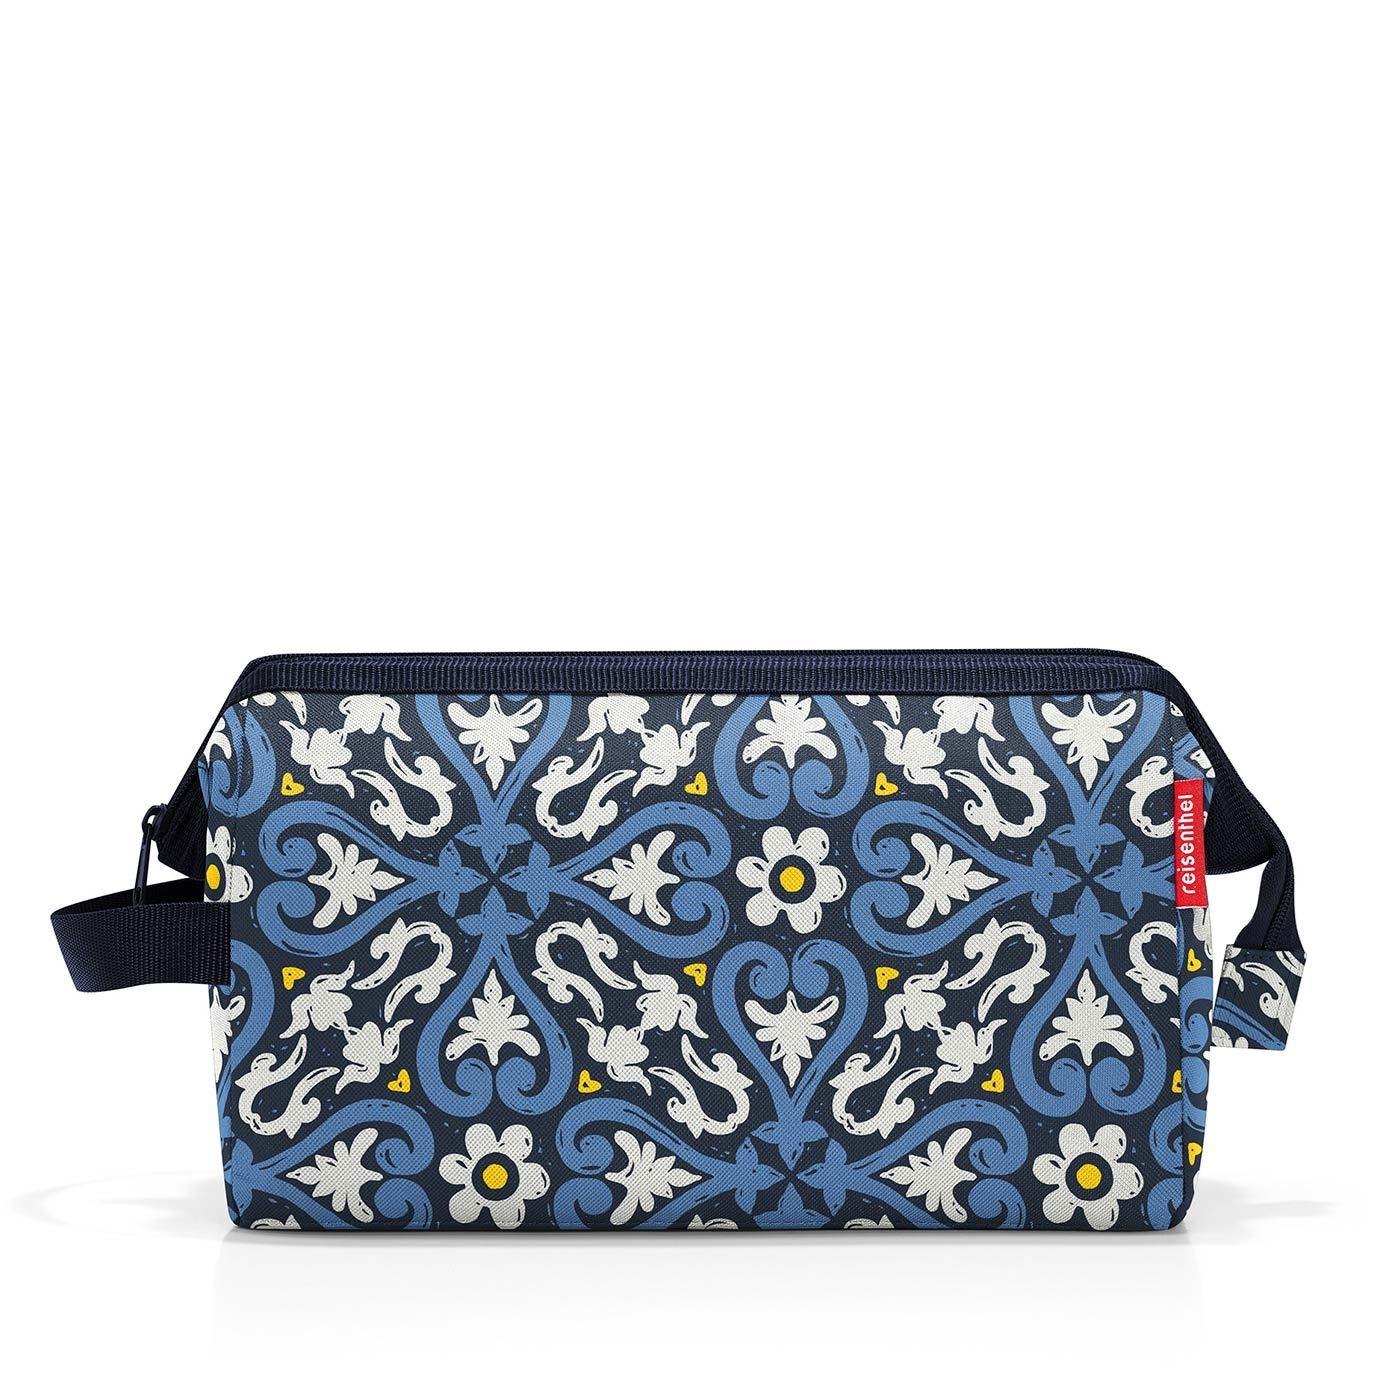 Kosmetická taška Travelcosmetic XL floral 1_0